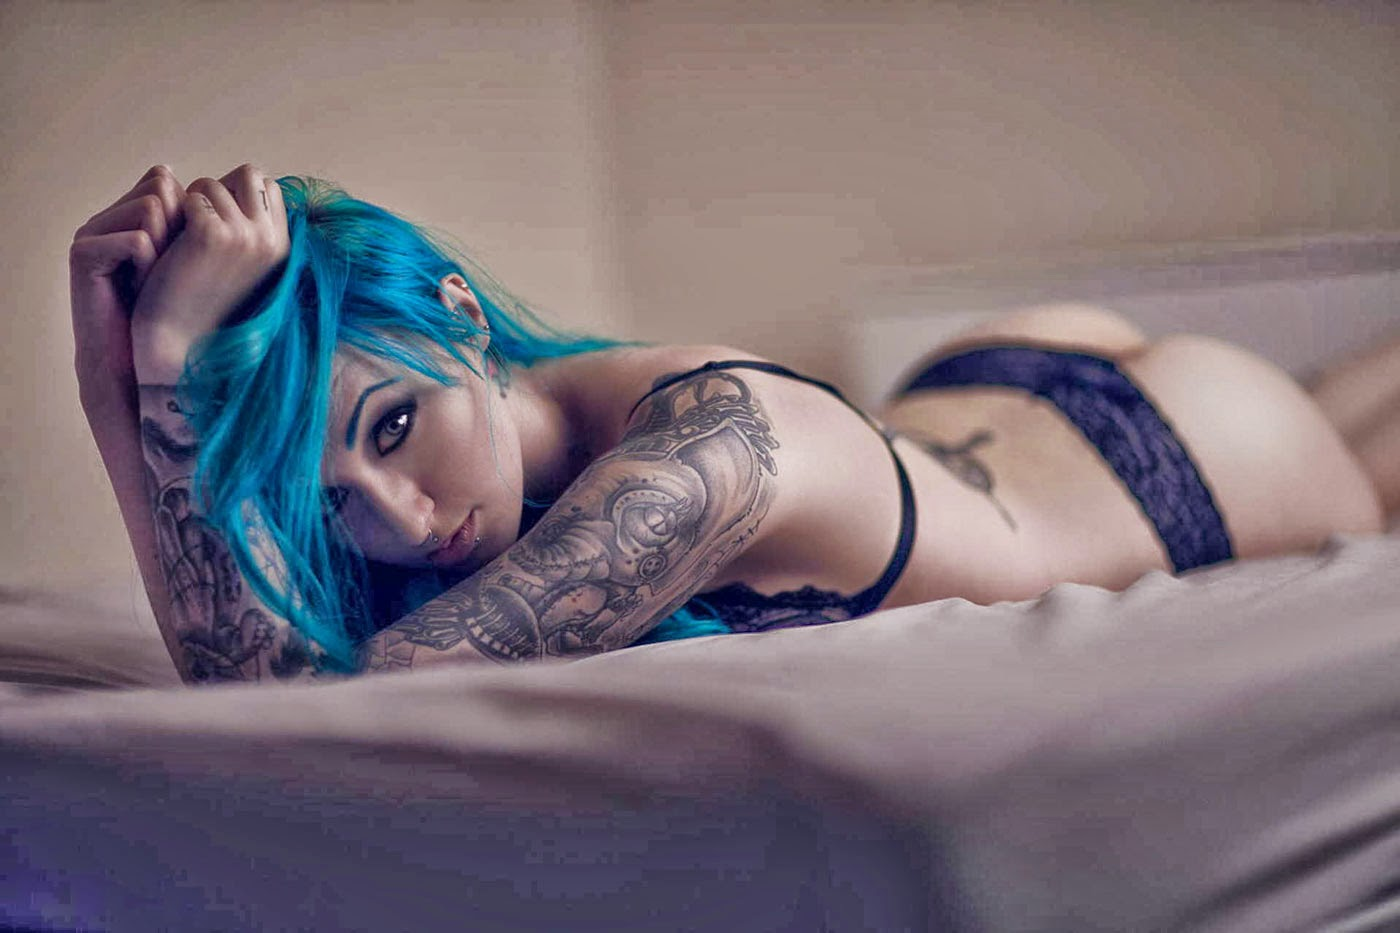 from Izaiah hd nude tattoo girls